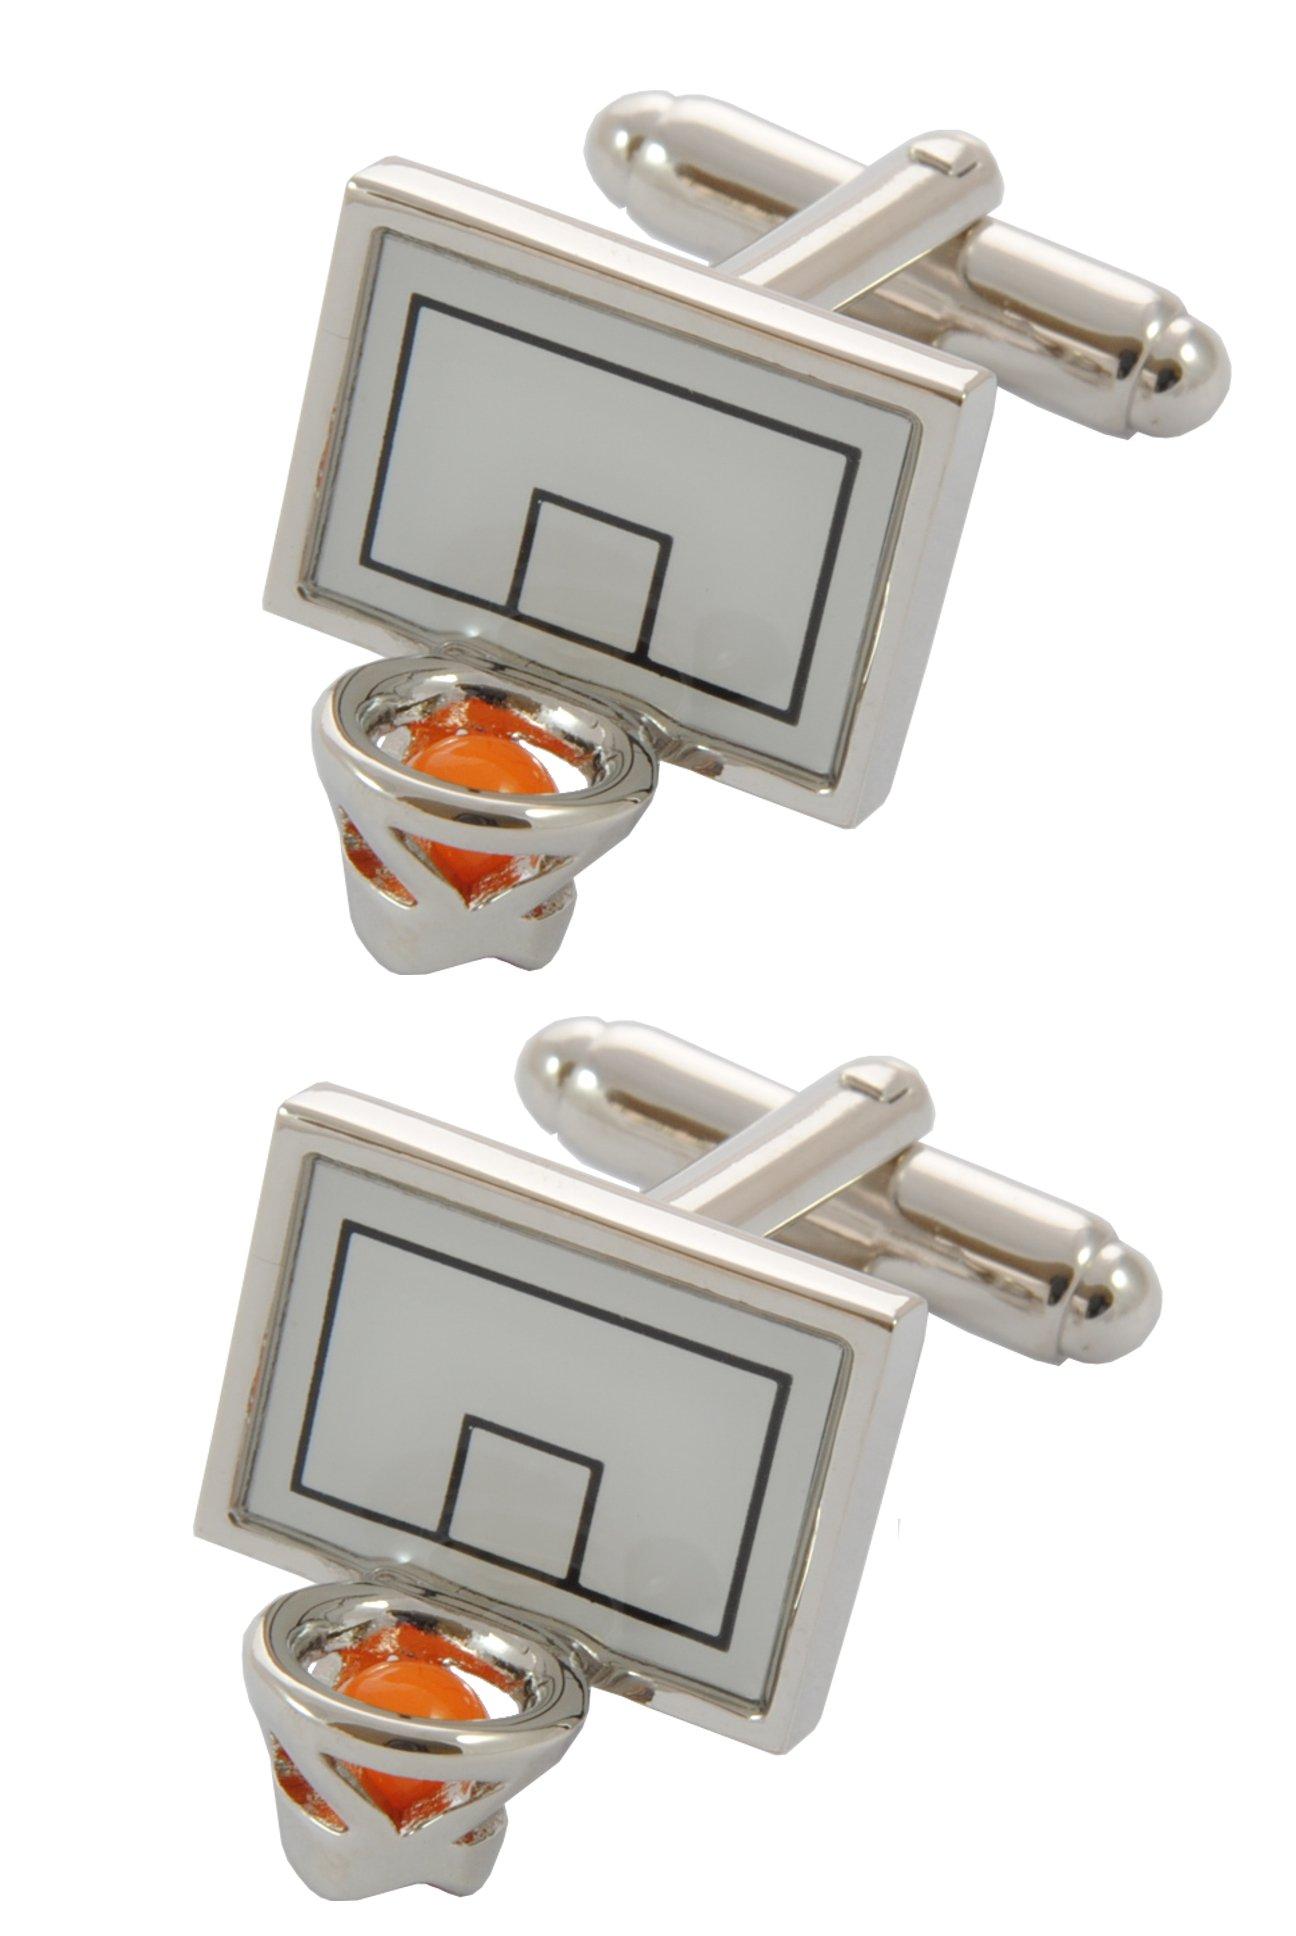 COLLAR AND CUFFS LONDON - Premium Cufflinks with Gift Box - Basketball - Basket Goal Net Court Match Sport Shoot Ball Hoop Goal - Silver and White Colours